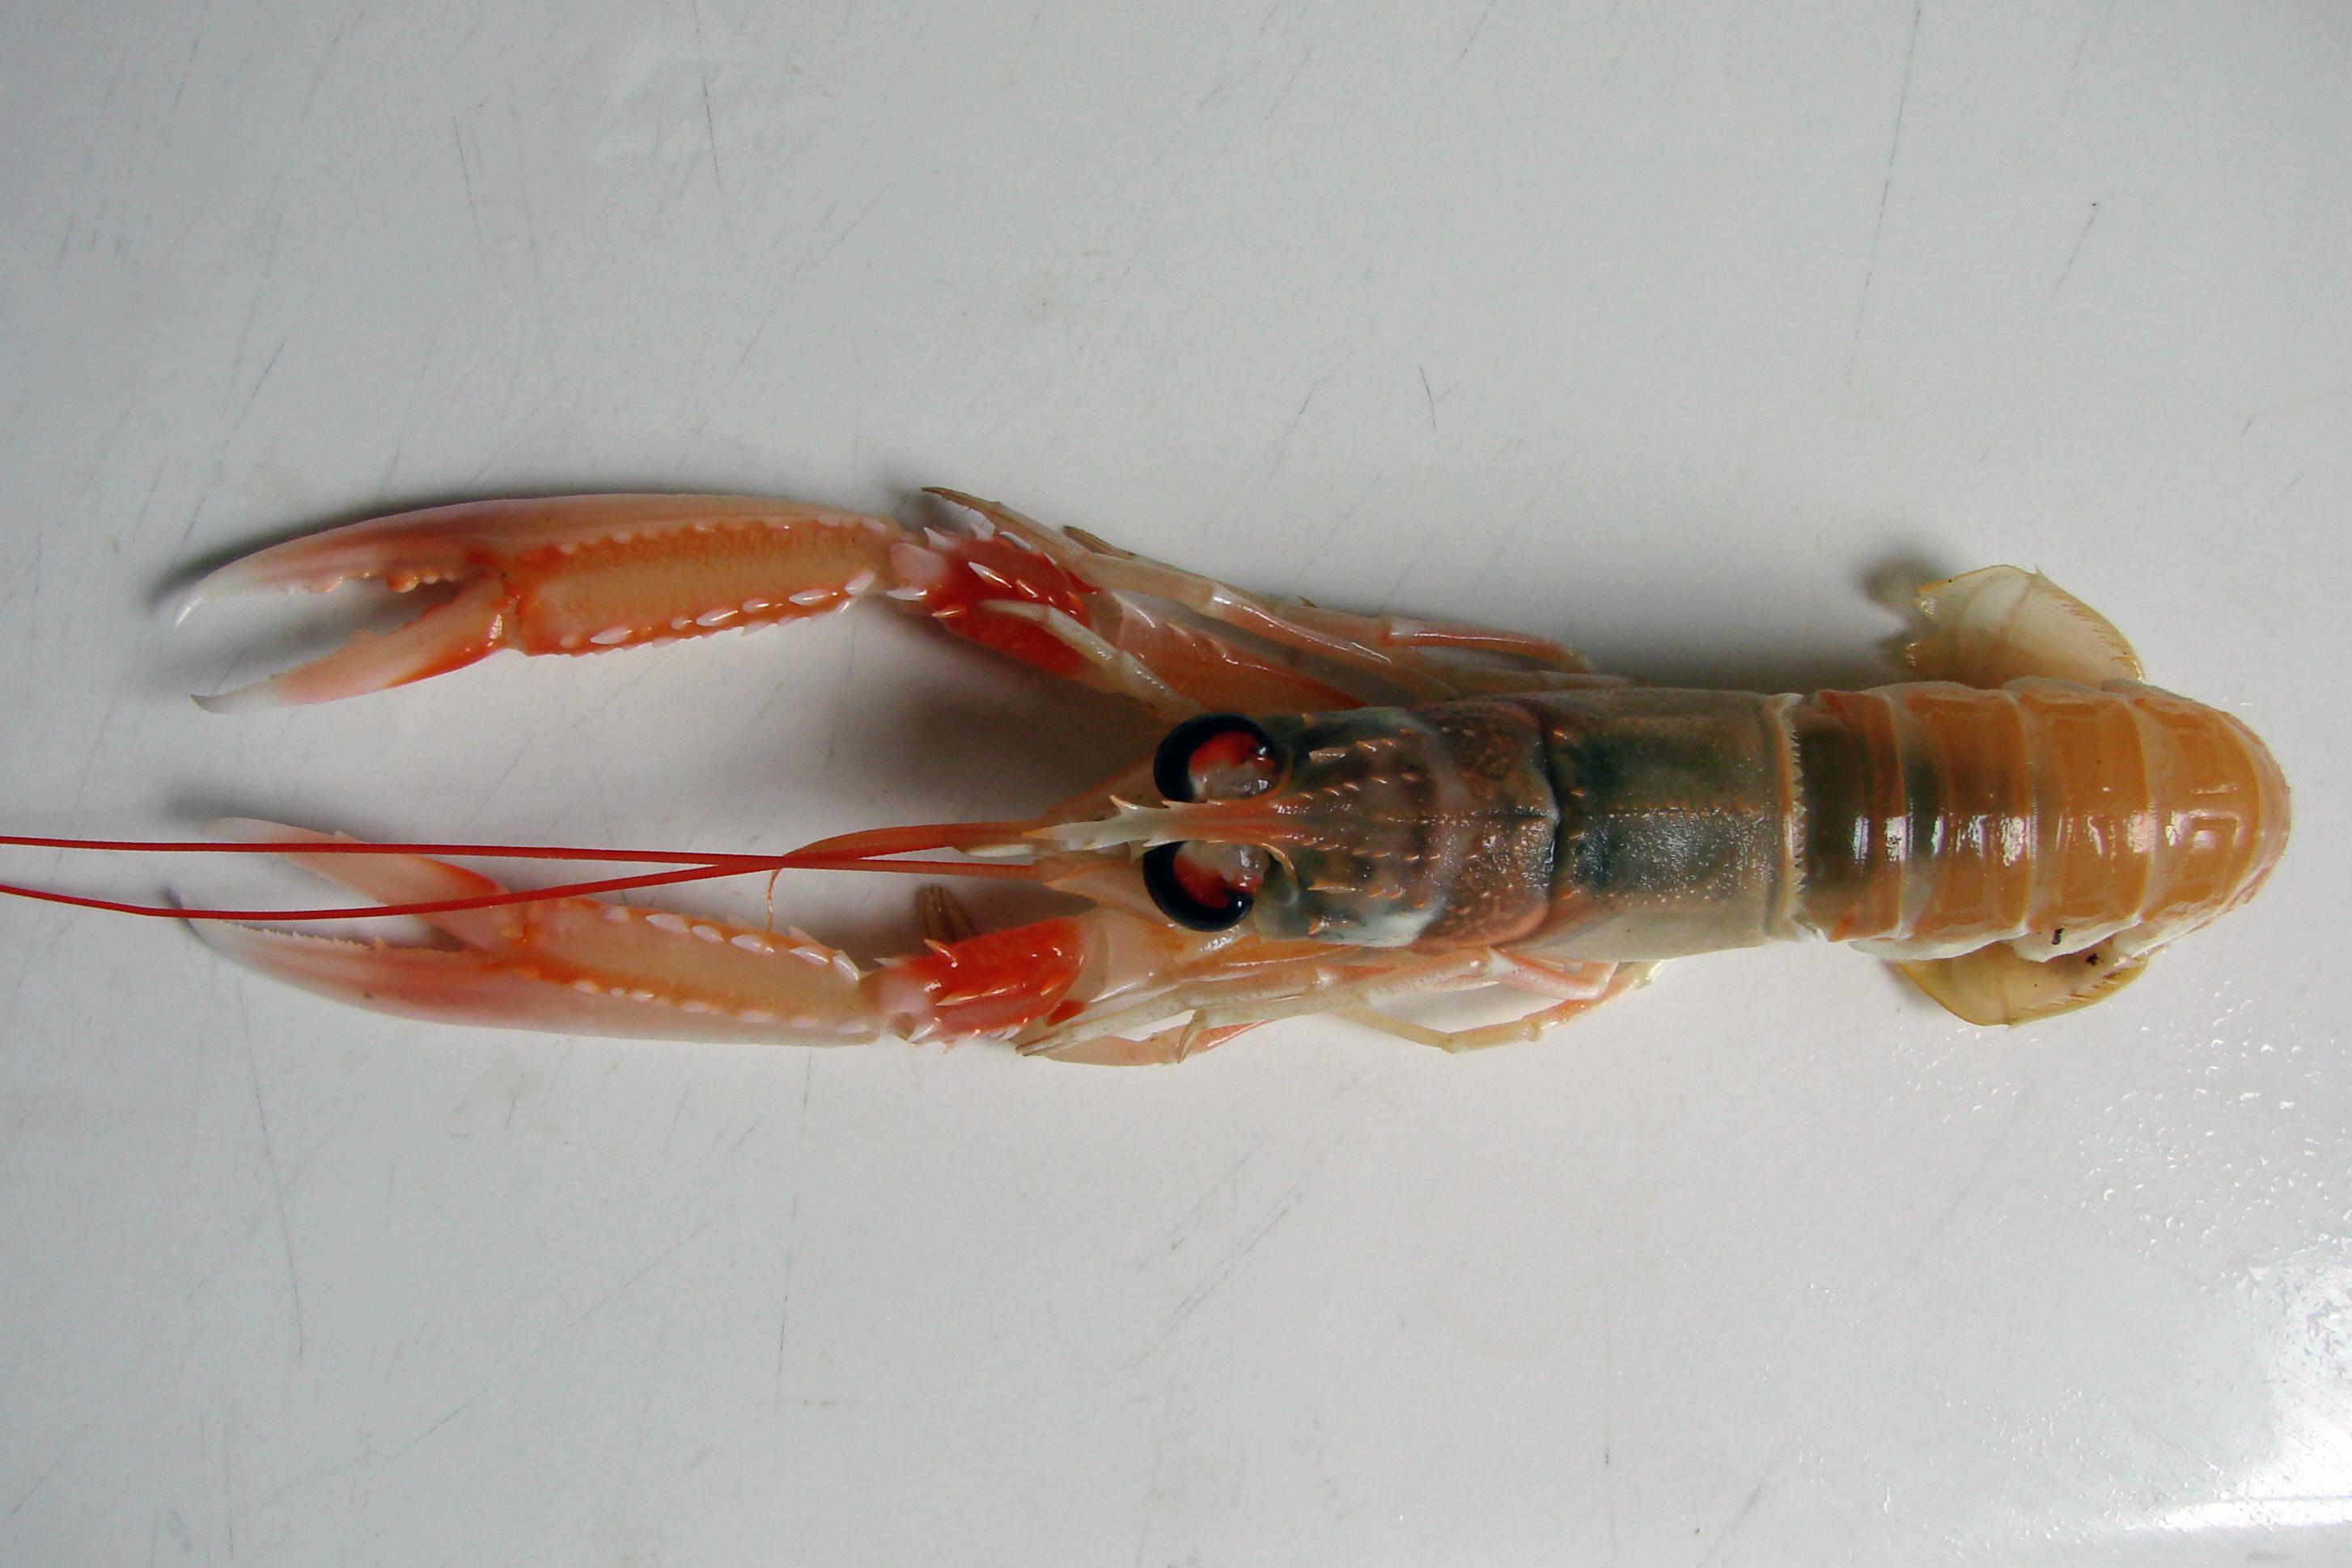 Image of Norway Lobster